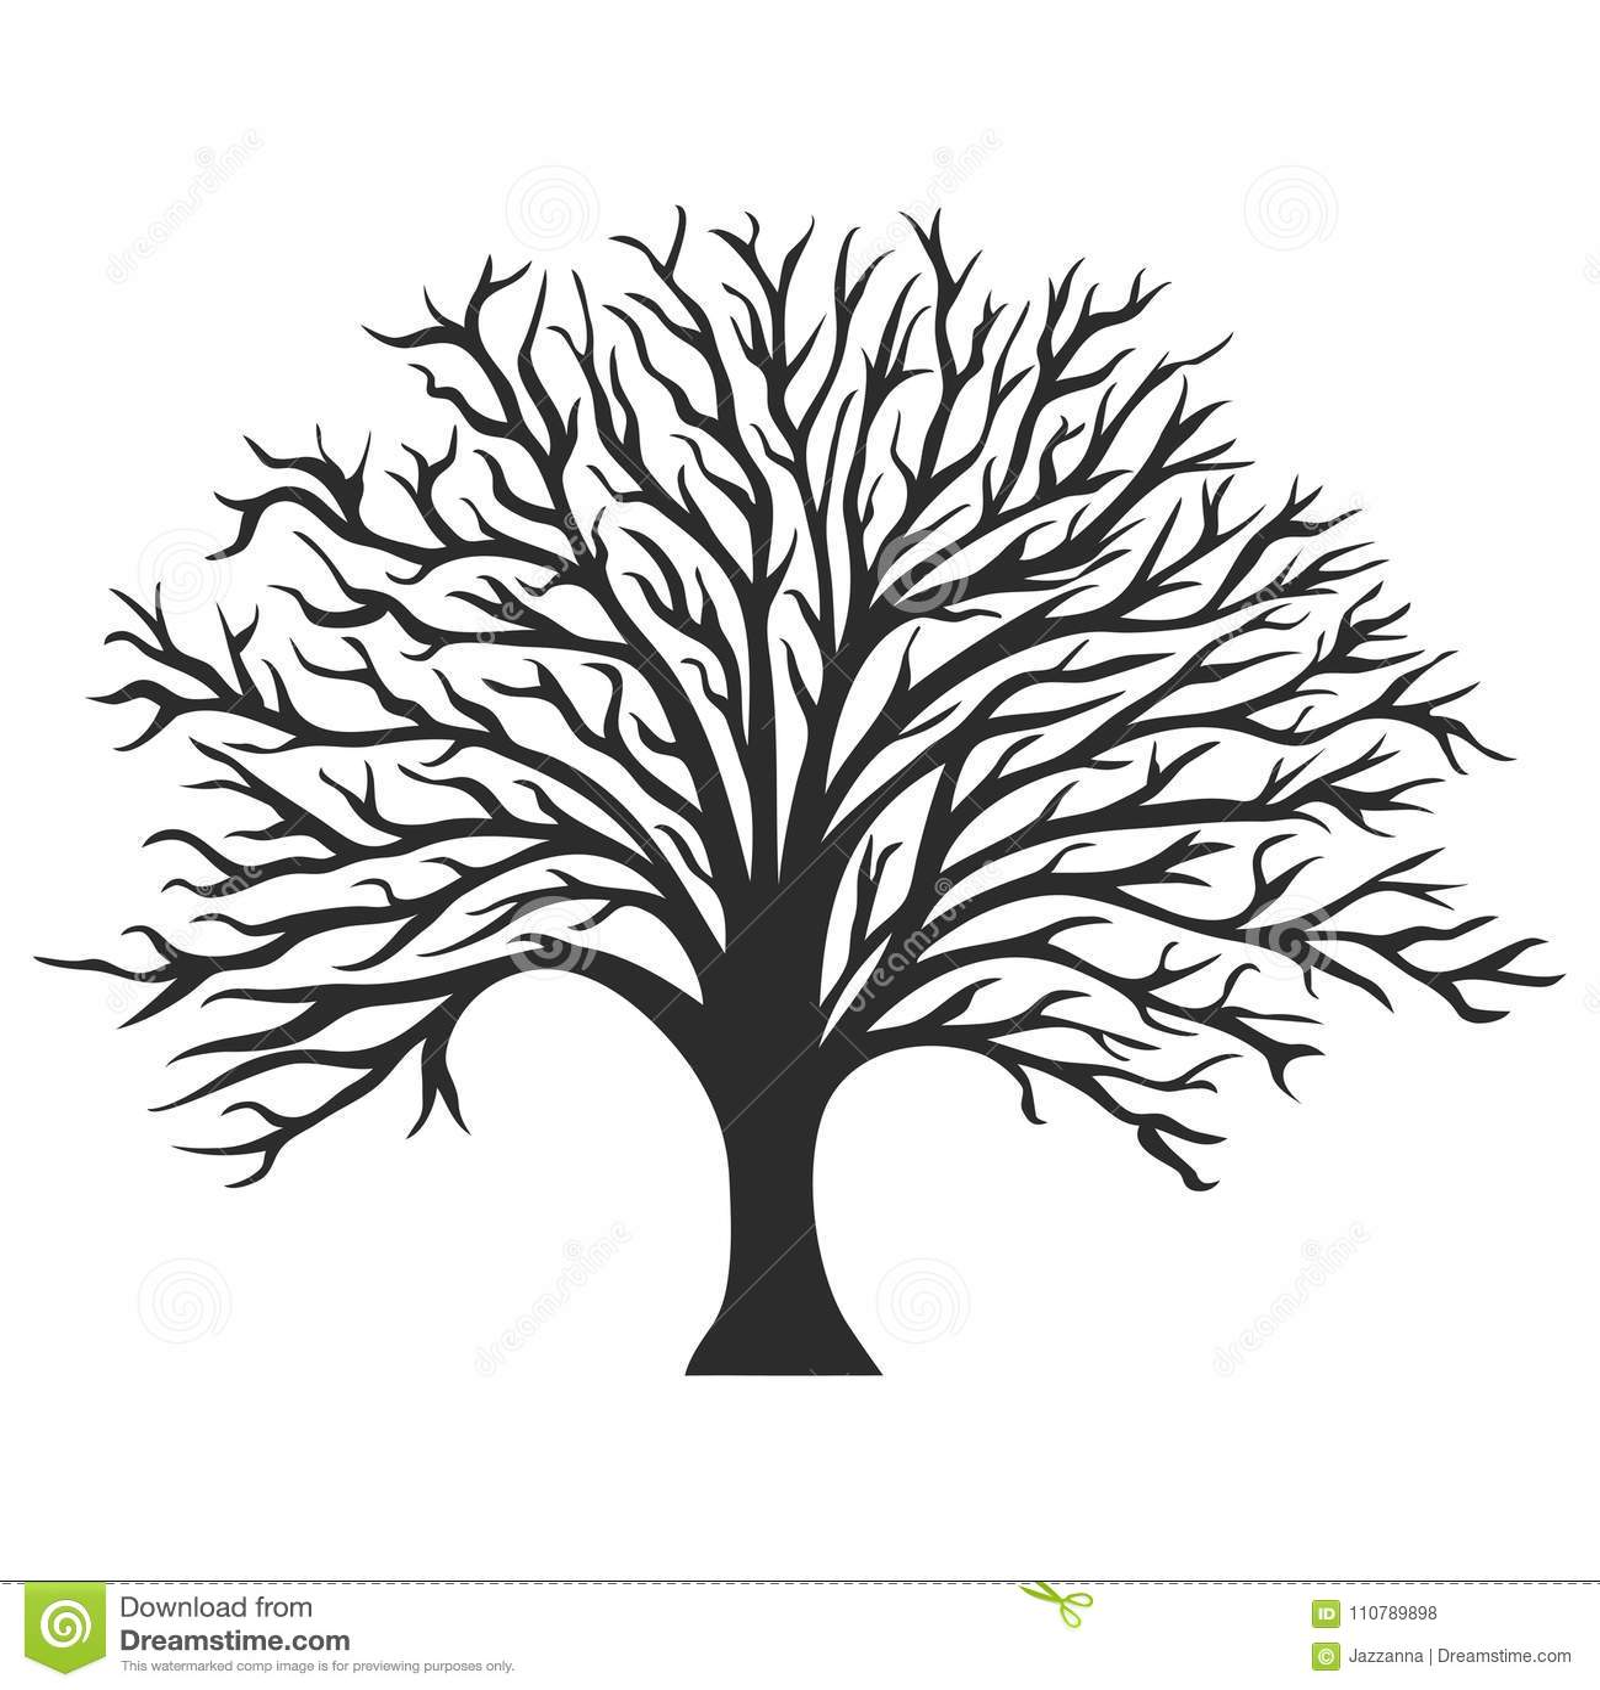 Object Oak Tree Silhouette Stock Vector Illustration Of